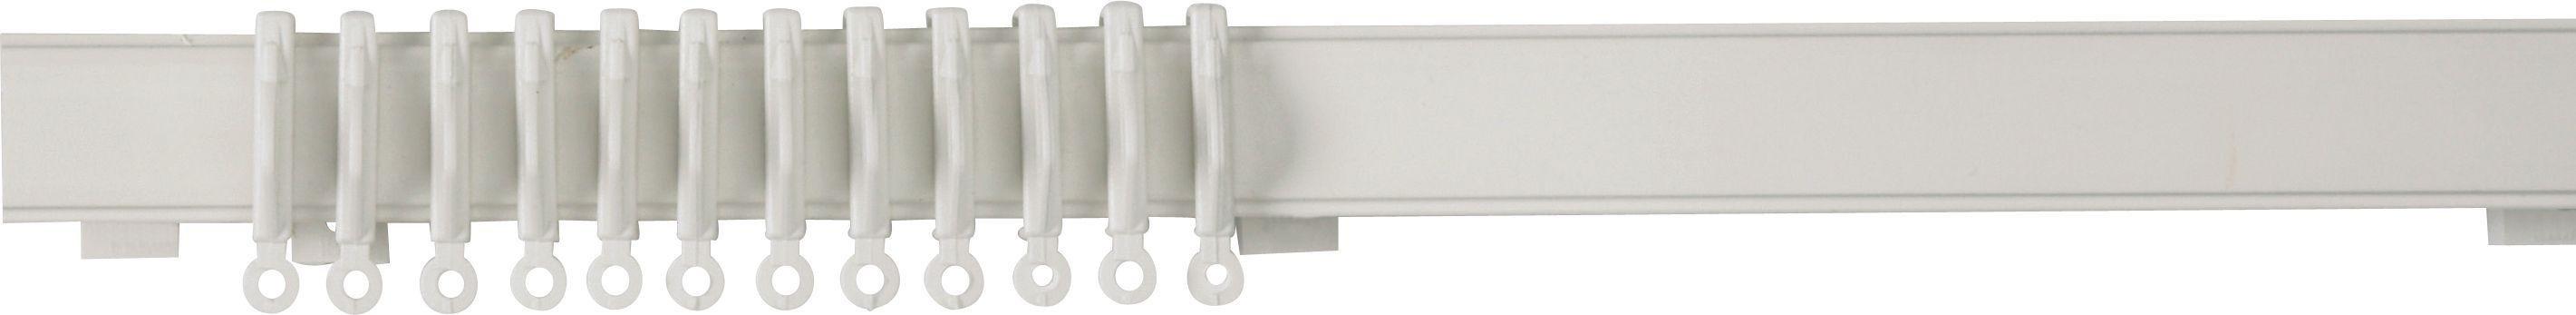 Argos Home 1.2m Lightweight Plastic Curtain Track - White